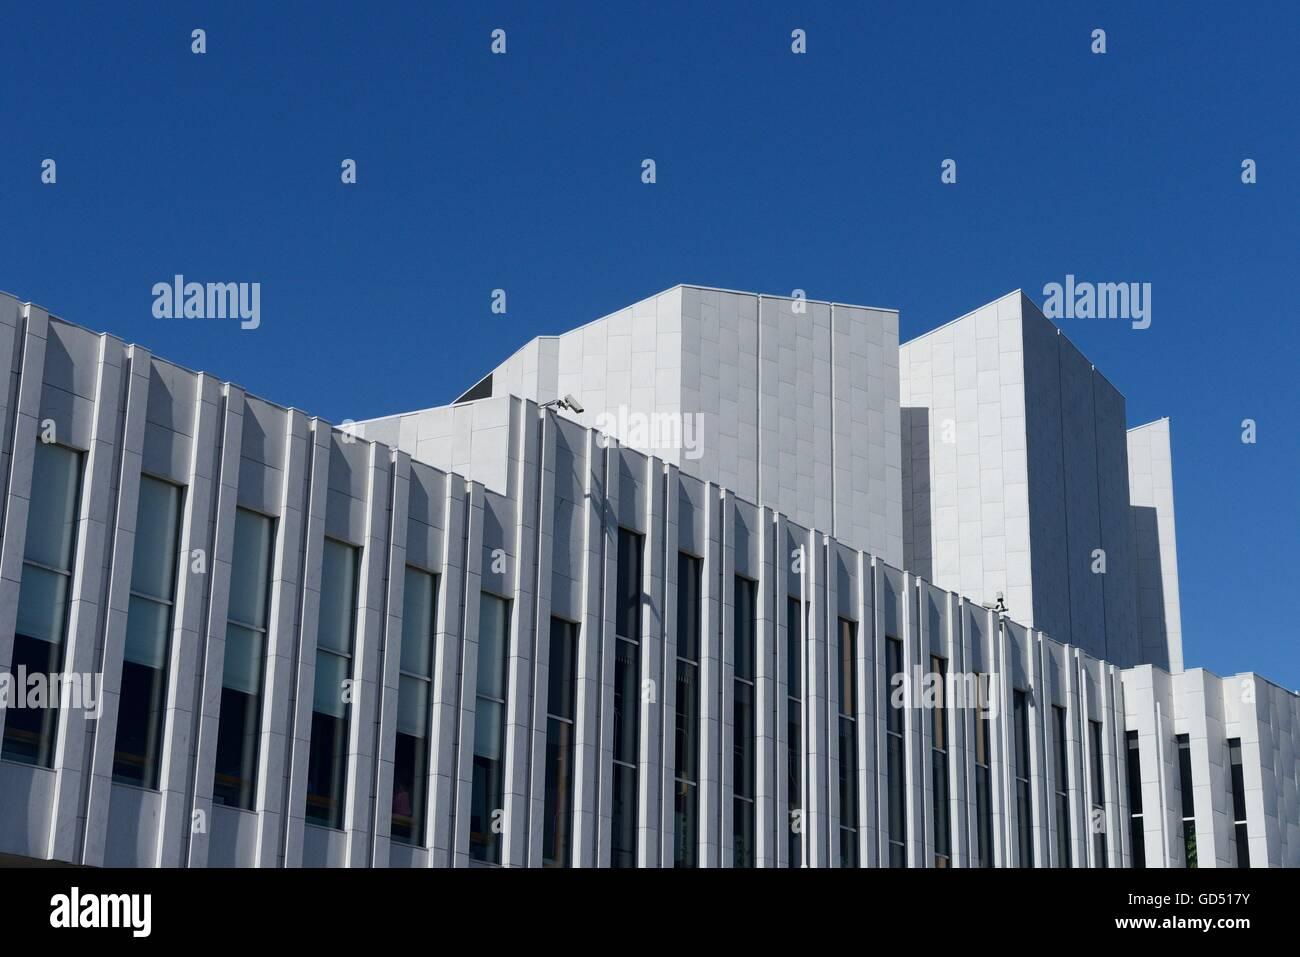 Finnlandia-Halle, weisser Marmor, Architekt Alvar Aalto, Helsinki, Helsinki, Finnland - Stock Image